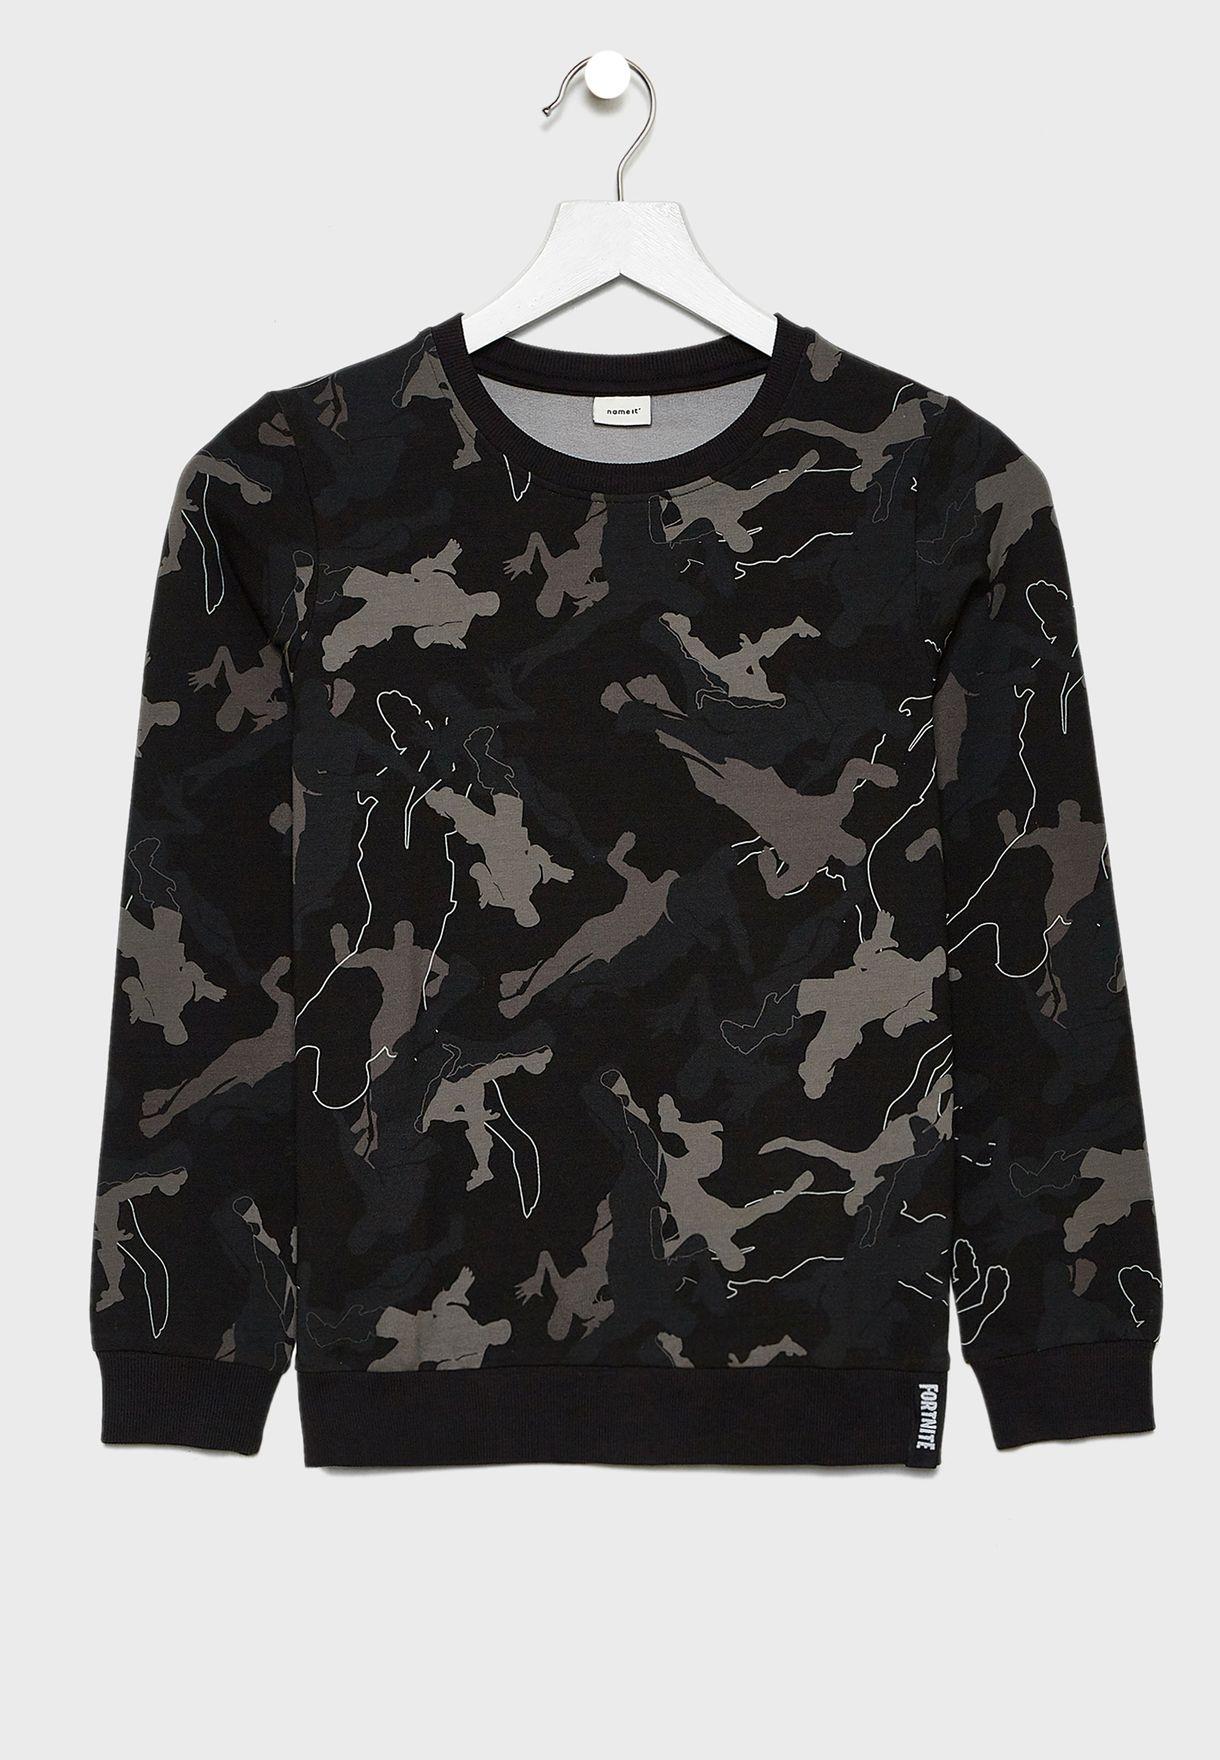 Teen Camo Printed Sweatshirt